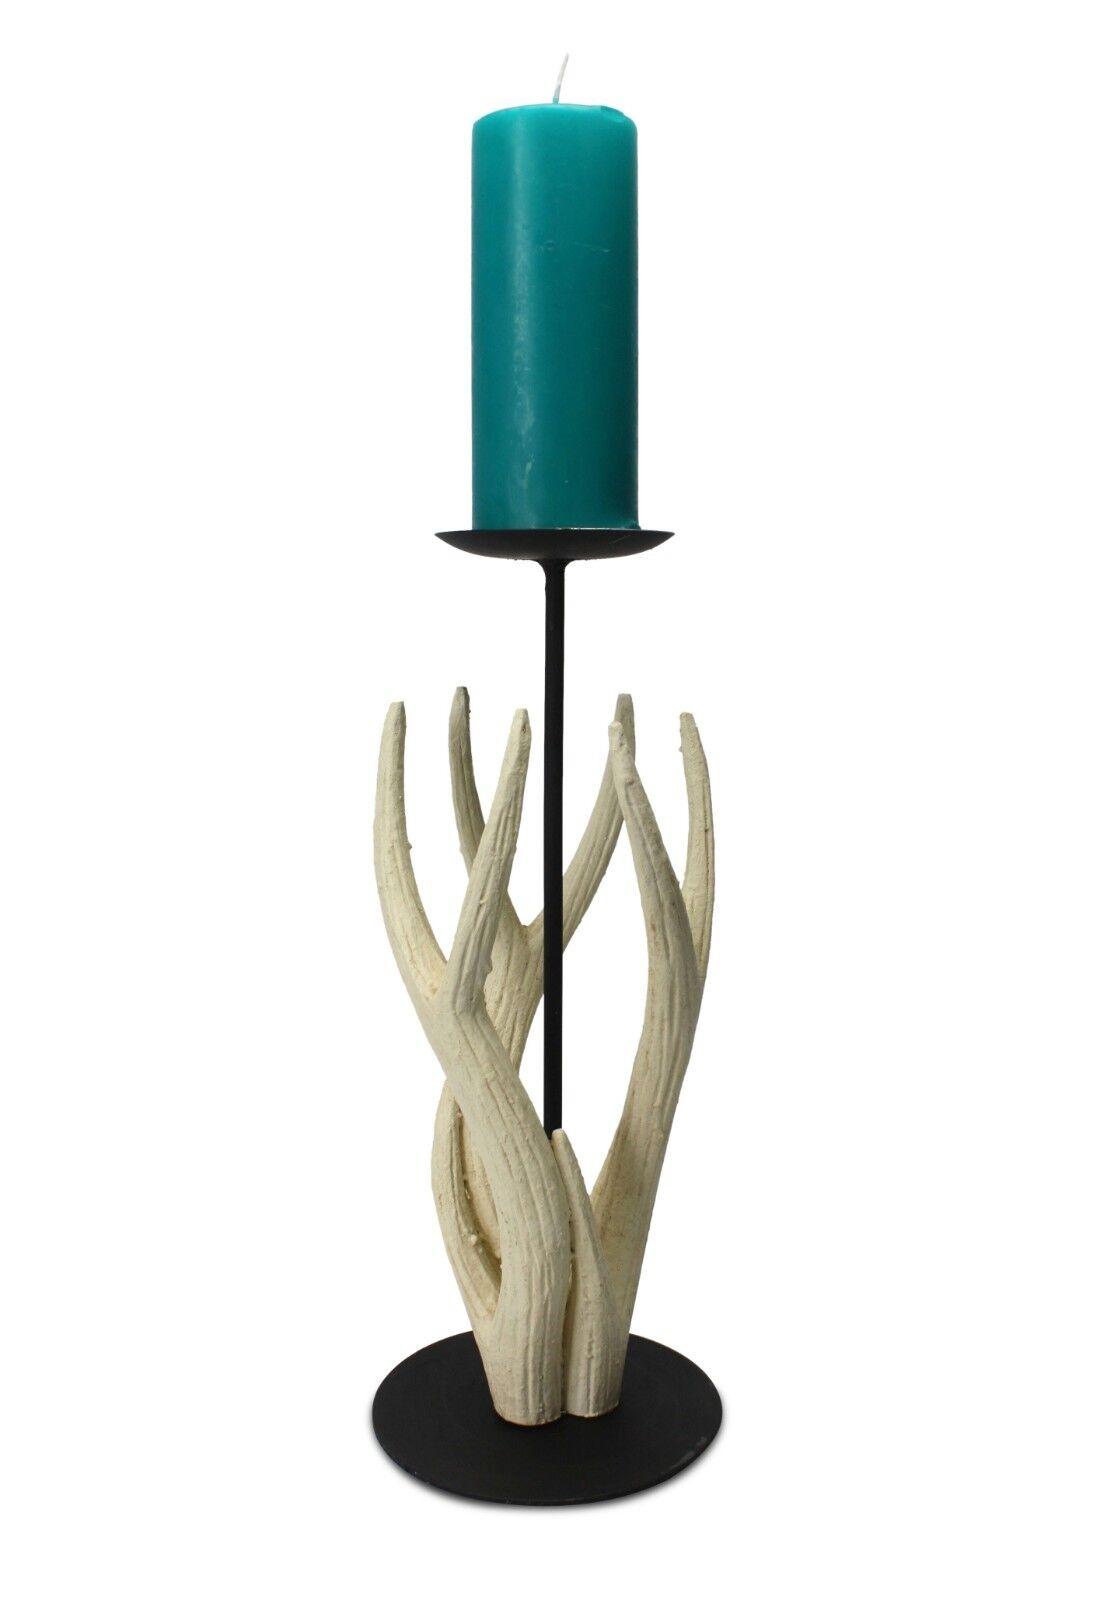 Thai Carved Wooden Antler Candle Holder, Medium 38cm high. Thailand. Handmade.